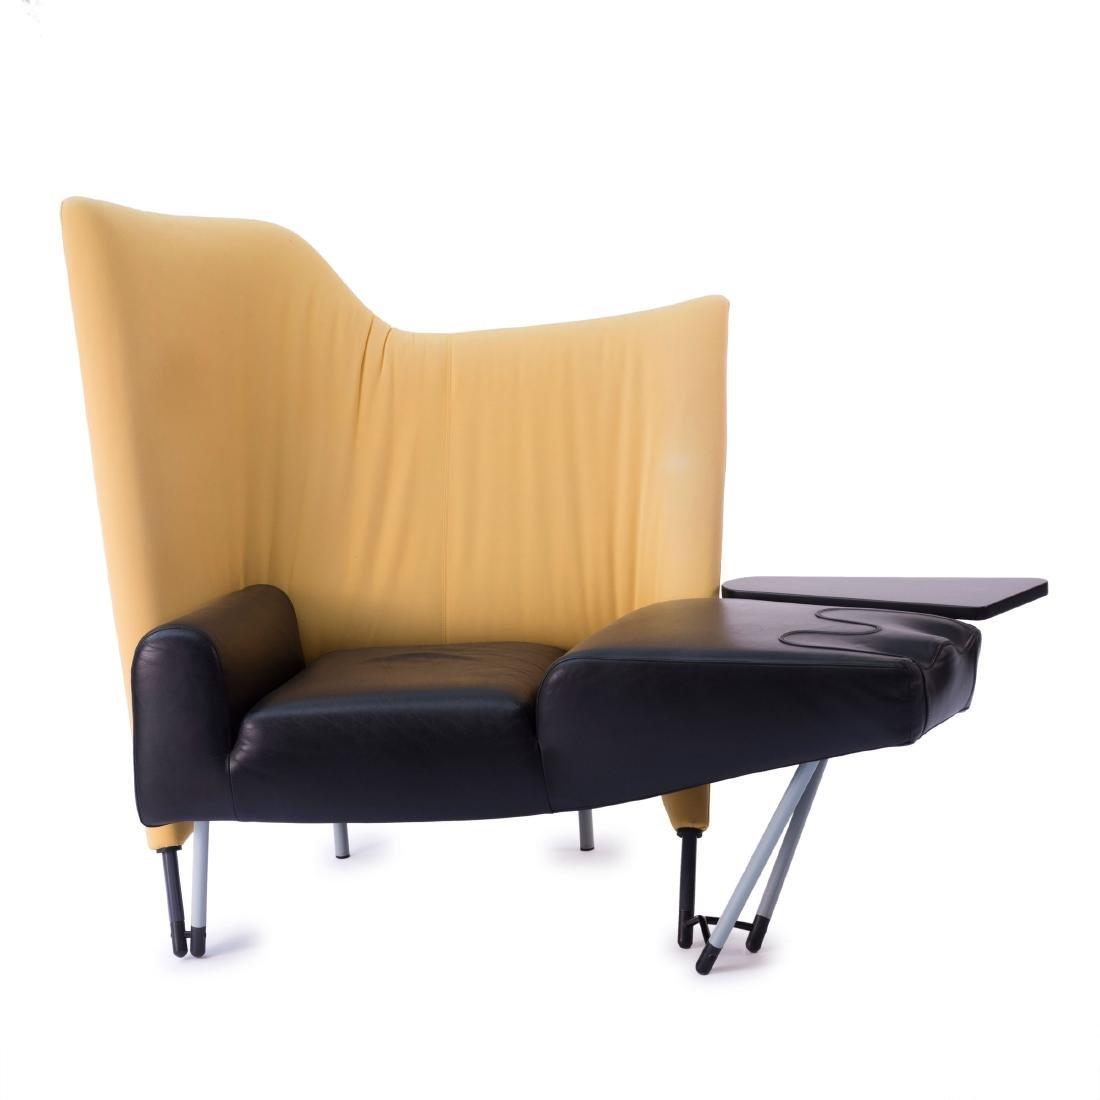 'Torso' lounge chair with ottoman, 1982